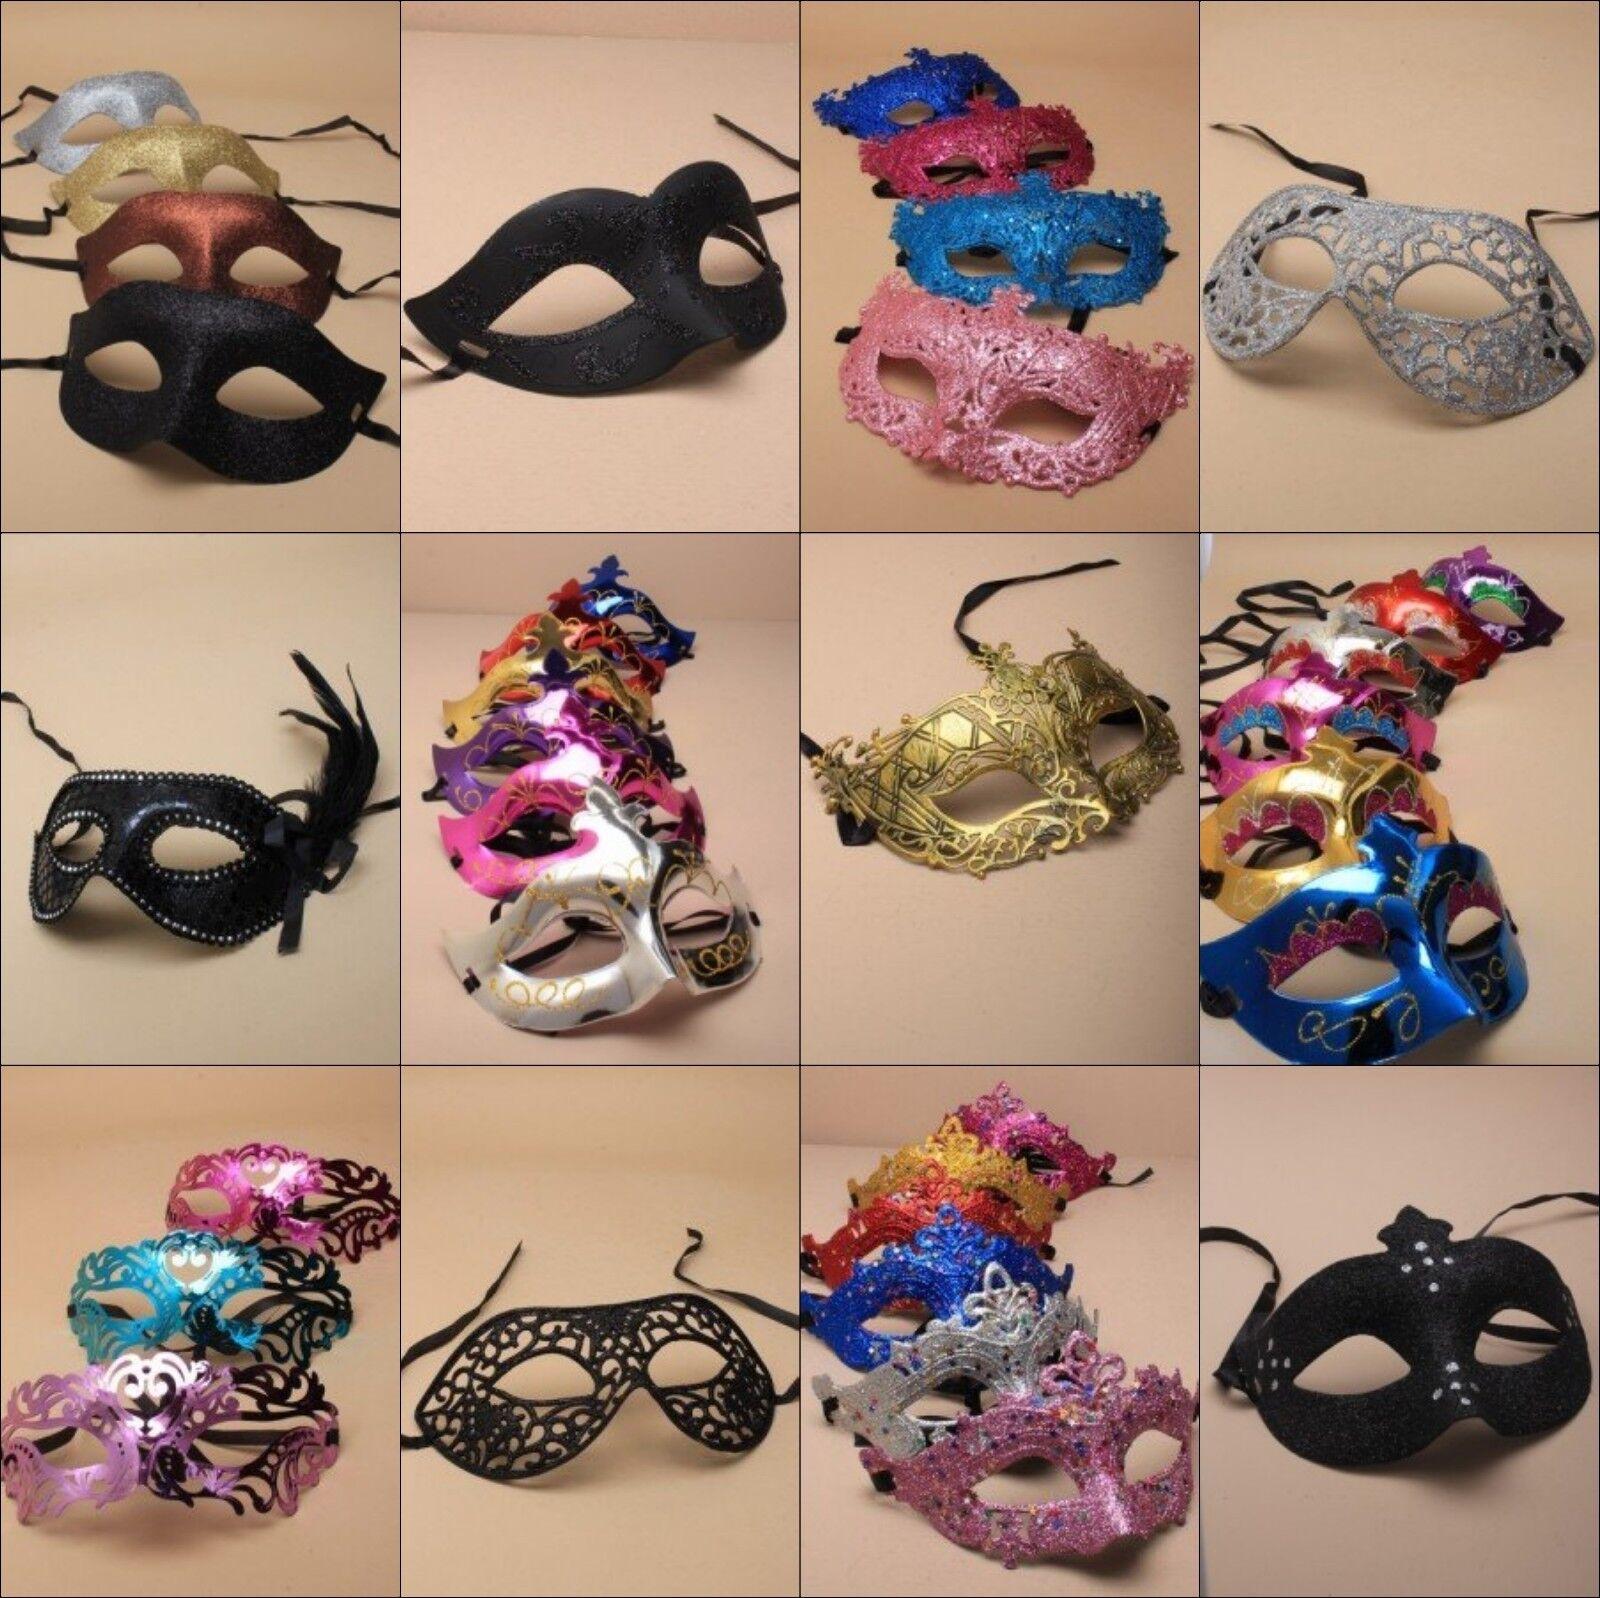 Masquerade Masquerade Masquerade Masques nouvel an Bal Party Costume Robe fantaisie gros vrac Gillter, 60c1ba